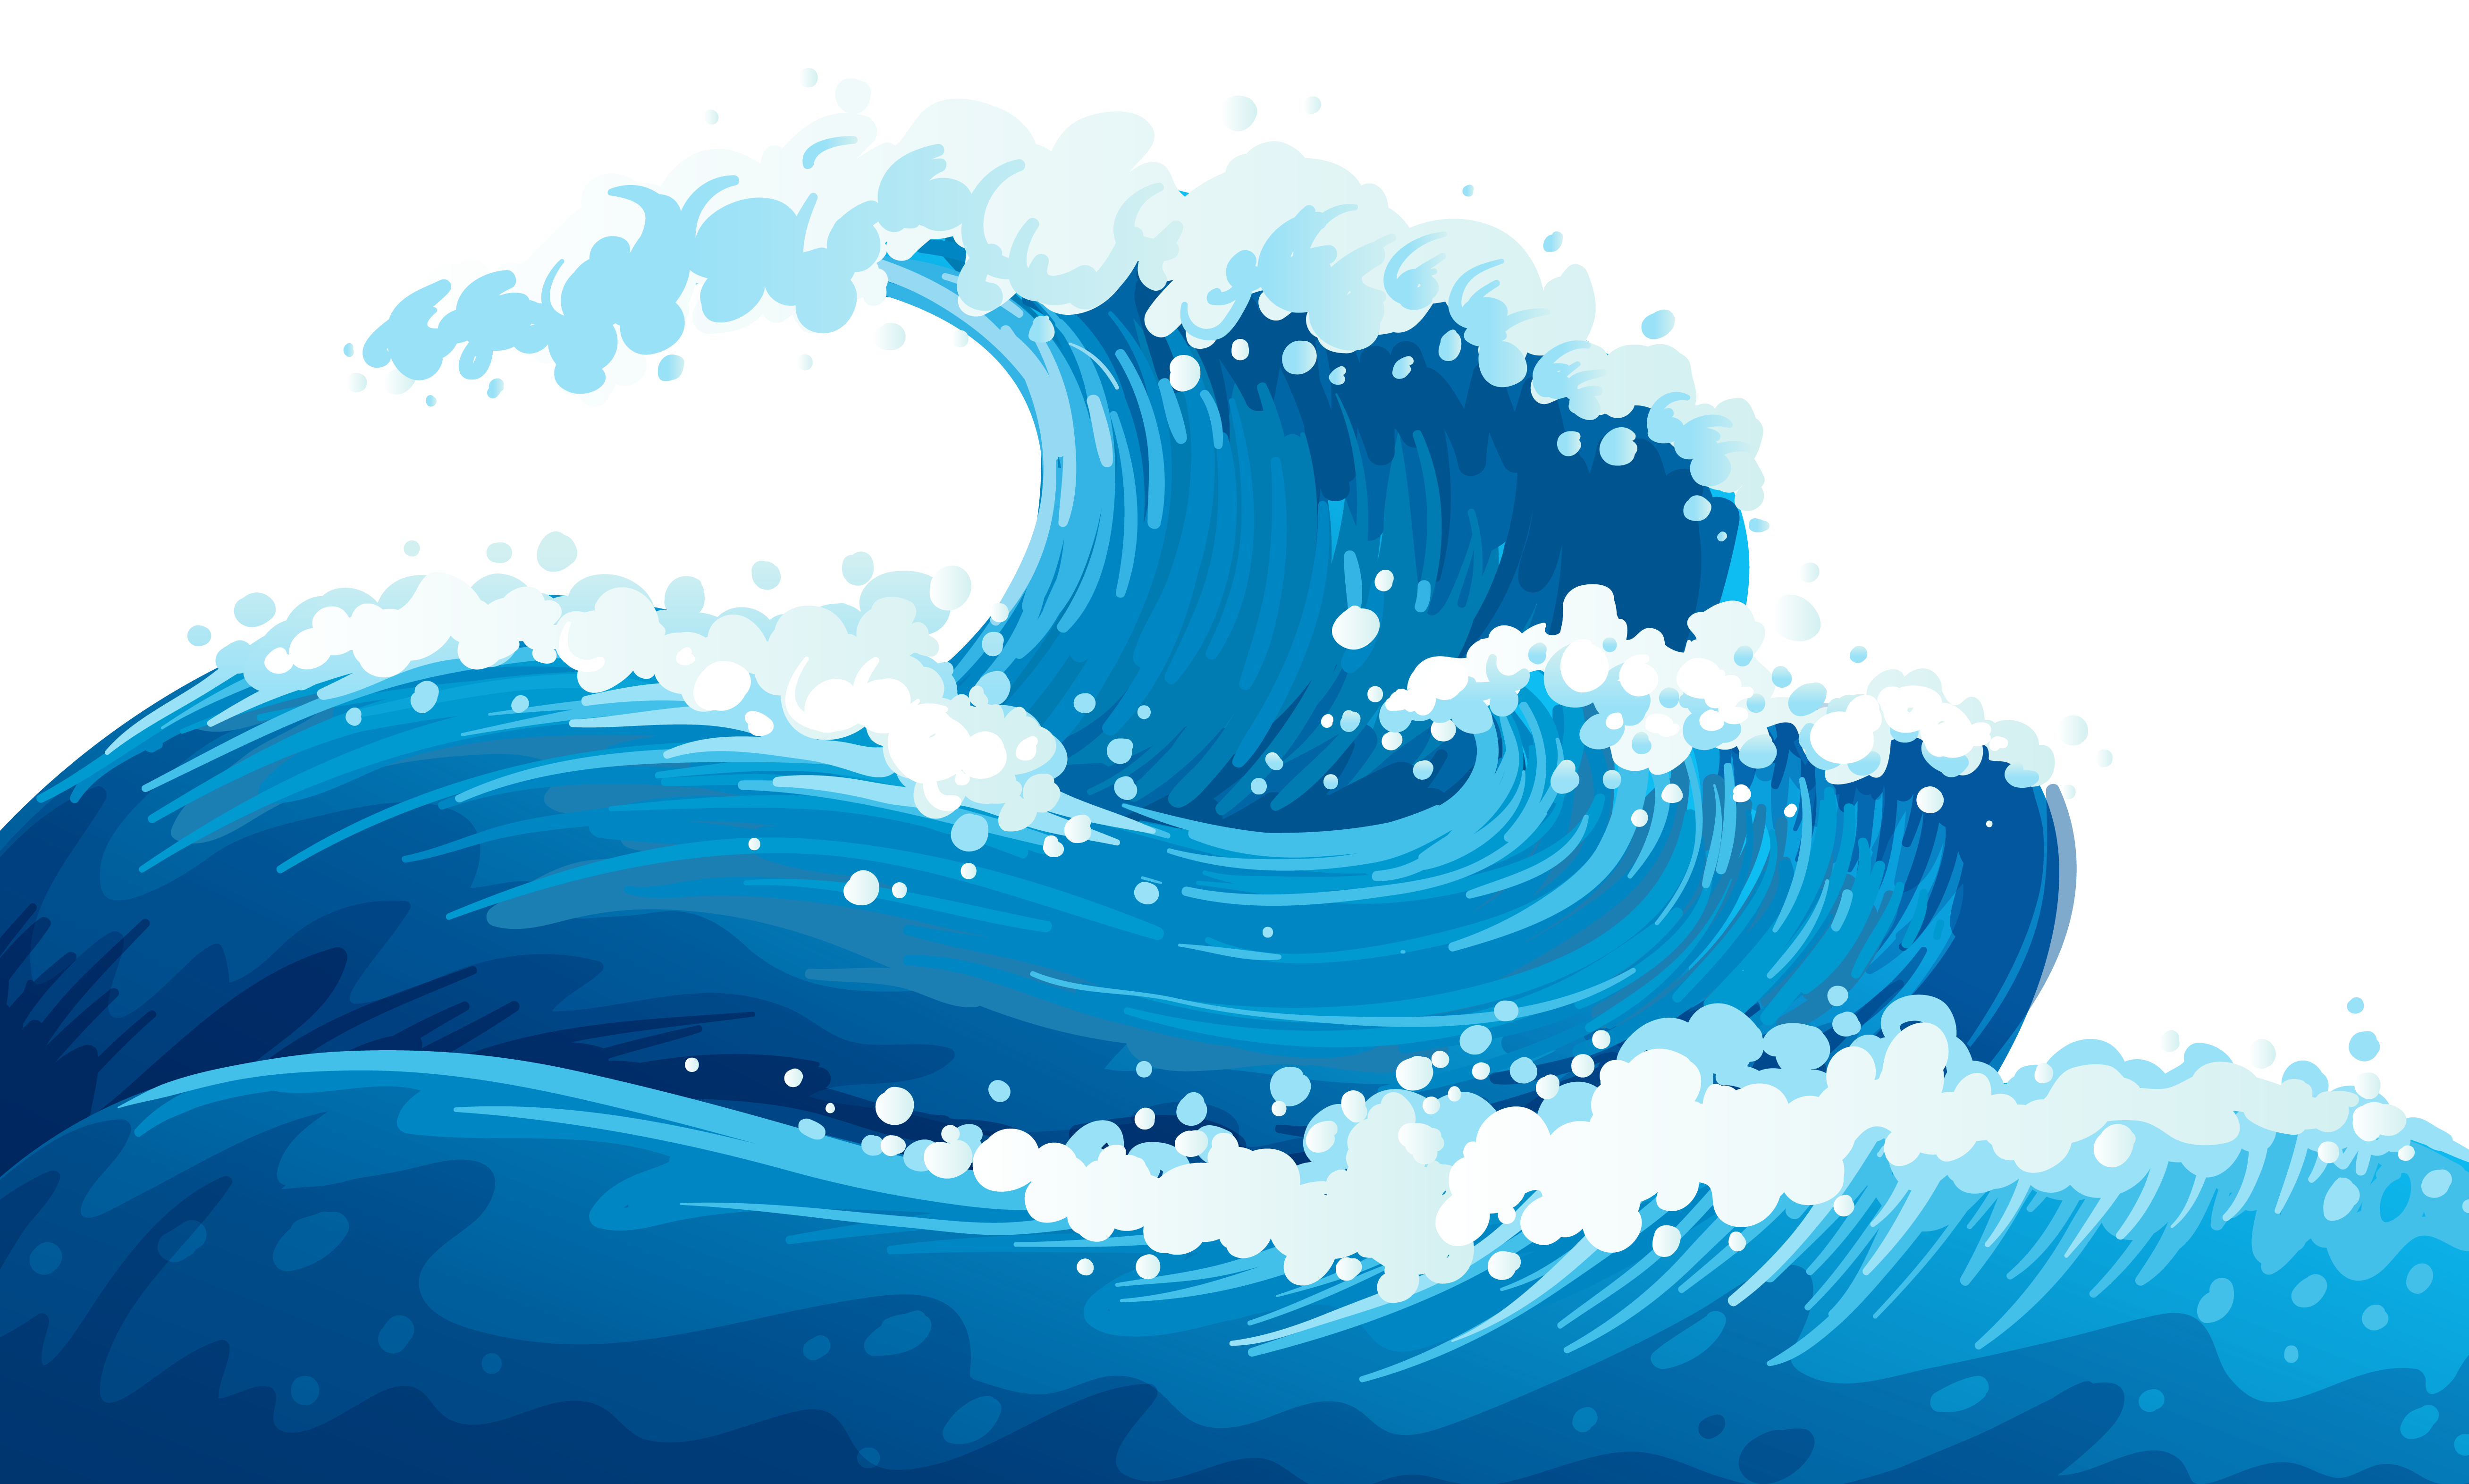 Sea clipart rough sea #7